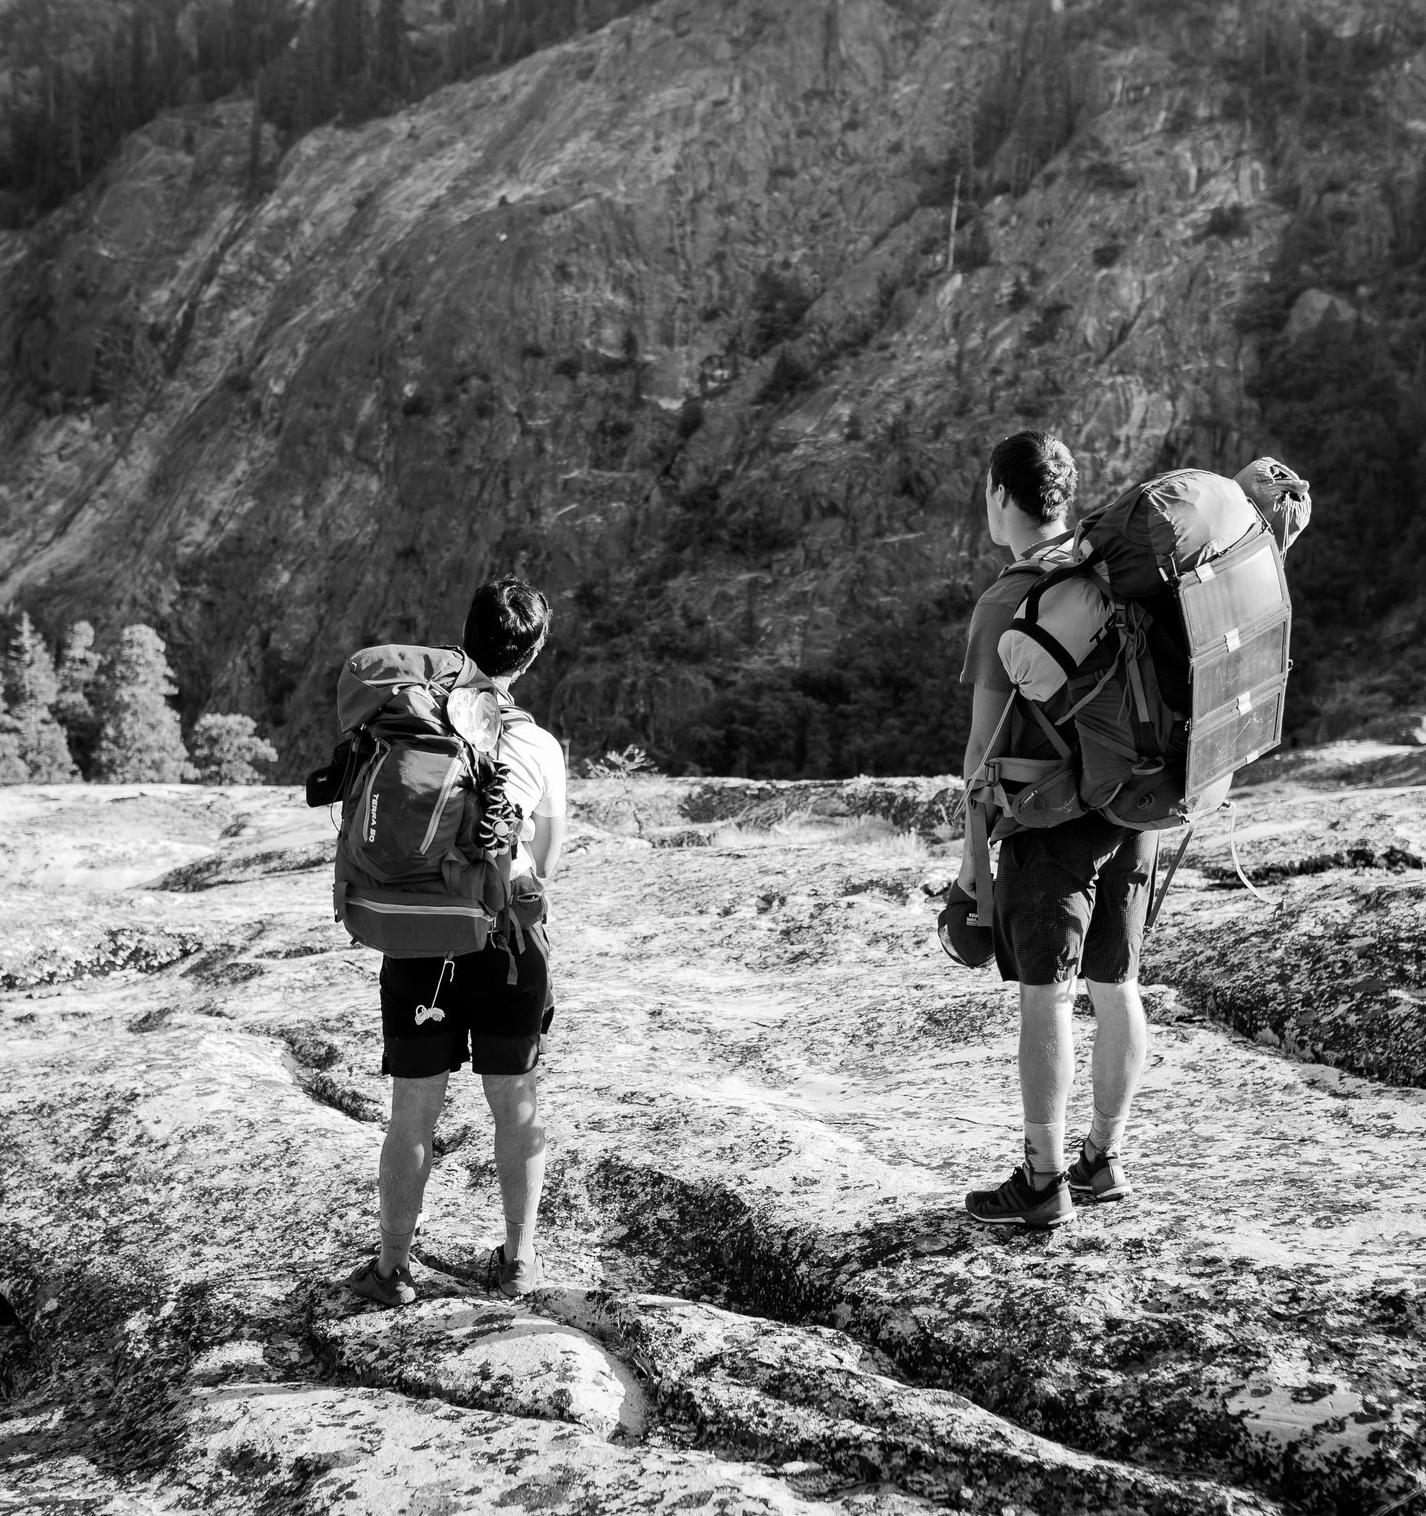 Staring down the deep canyons - Tuolumne County Yosemite adventure